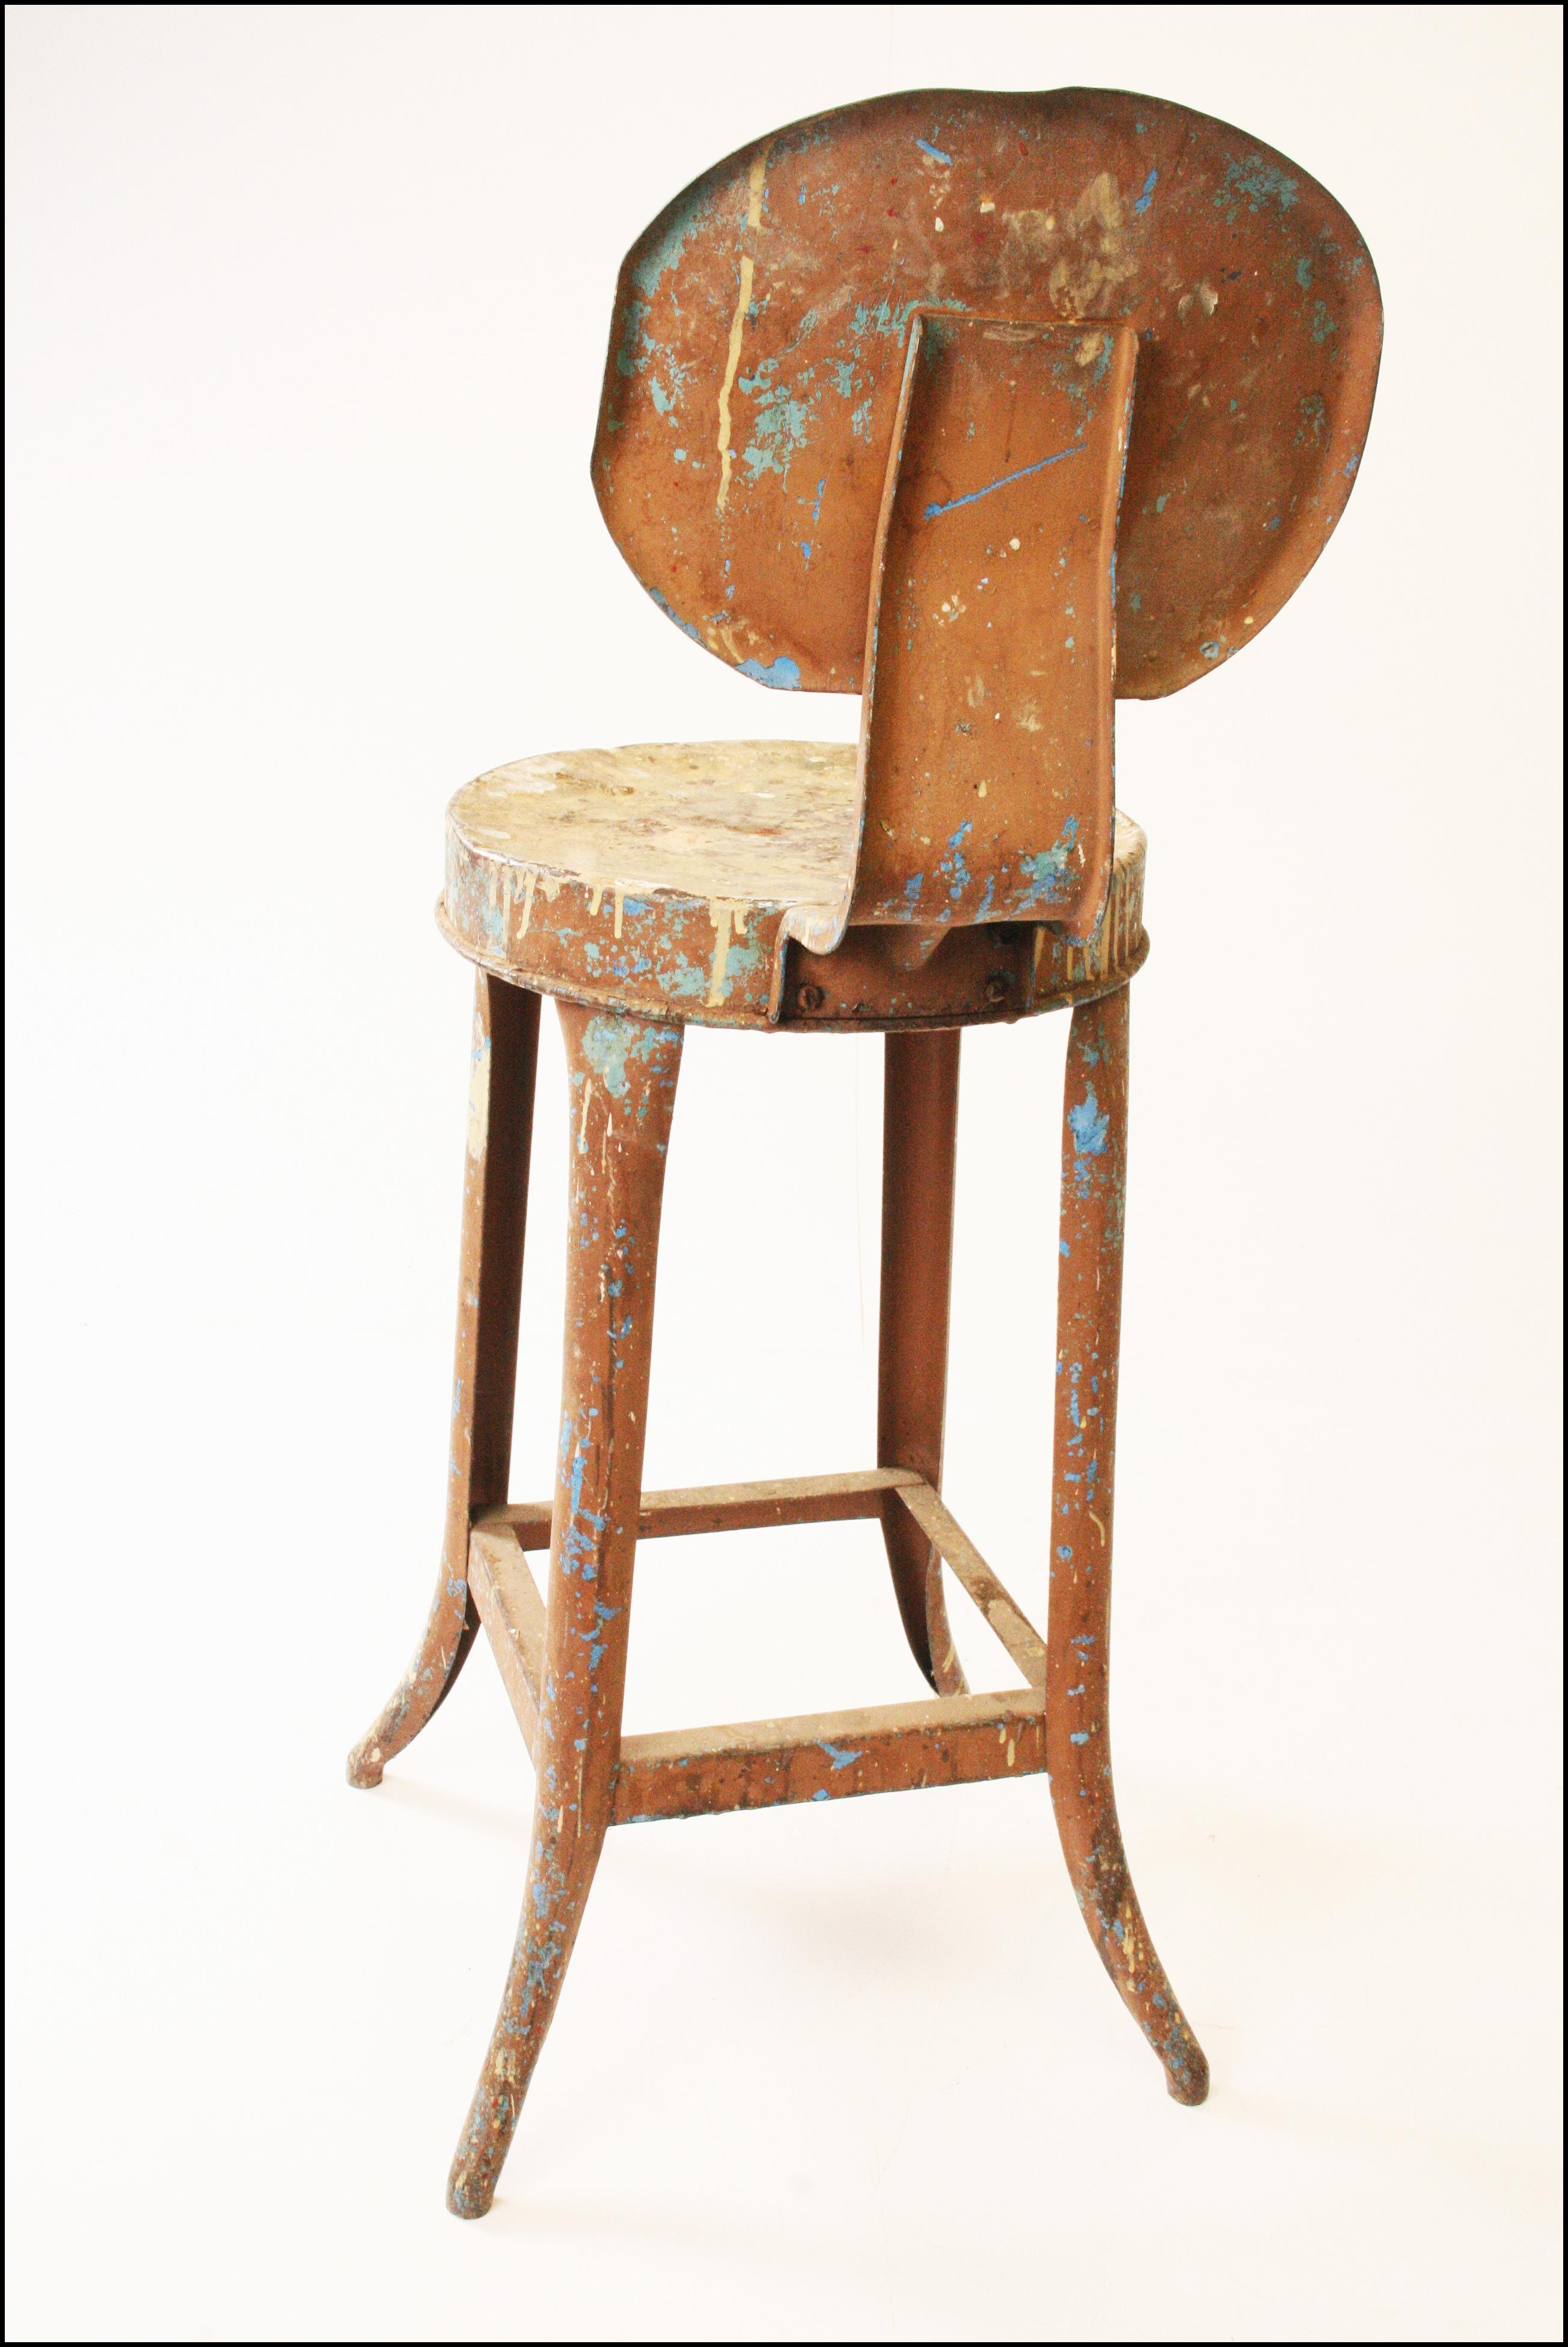 Vintage Industrial Metal Bar Stool Chairish : vintage industrial metal bar stool 0990aspectfitampwidth640ampheight640 from www.chairish.com size 640 x 640 jpeg 31kB